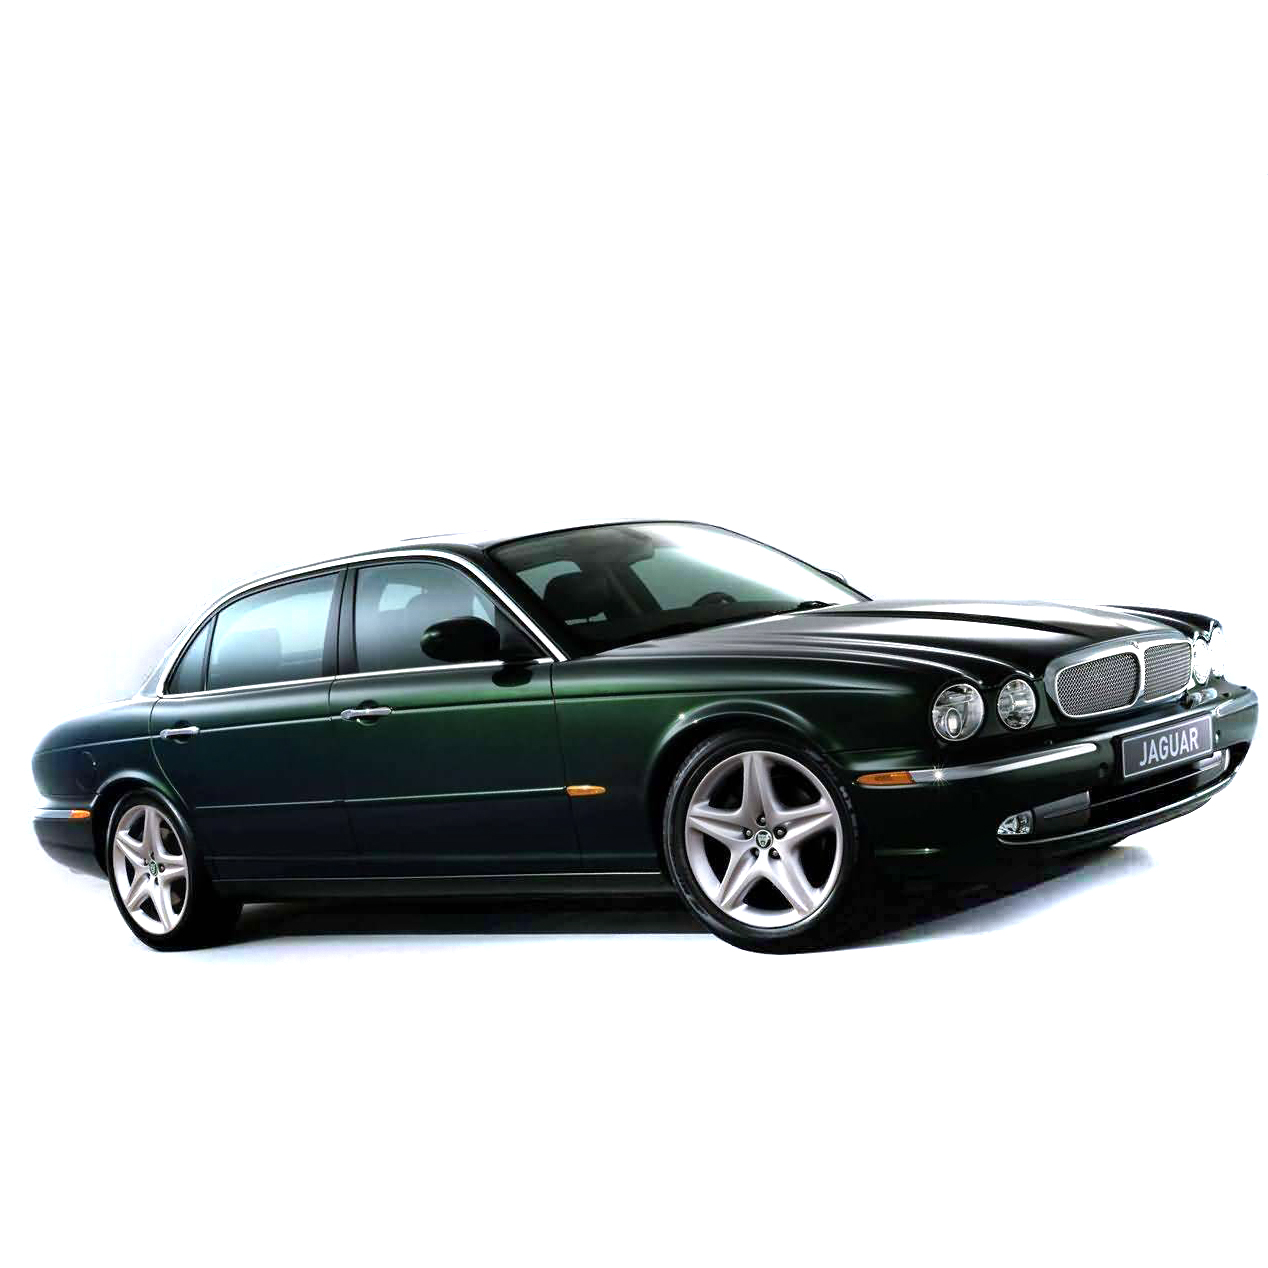 Jaguar XJ8 (Soverign LWB) 1997-2003